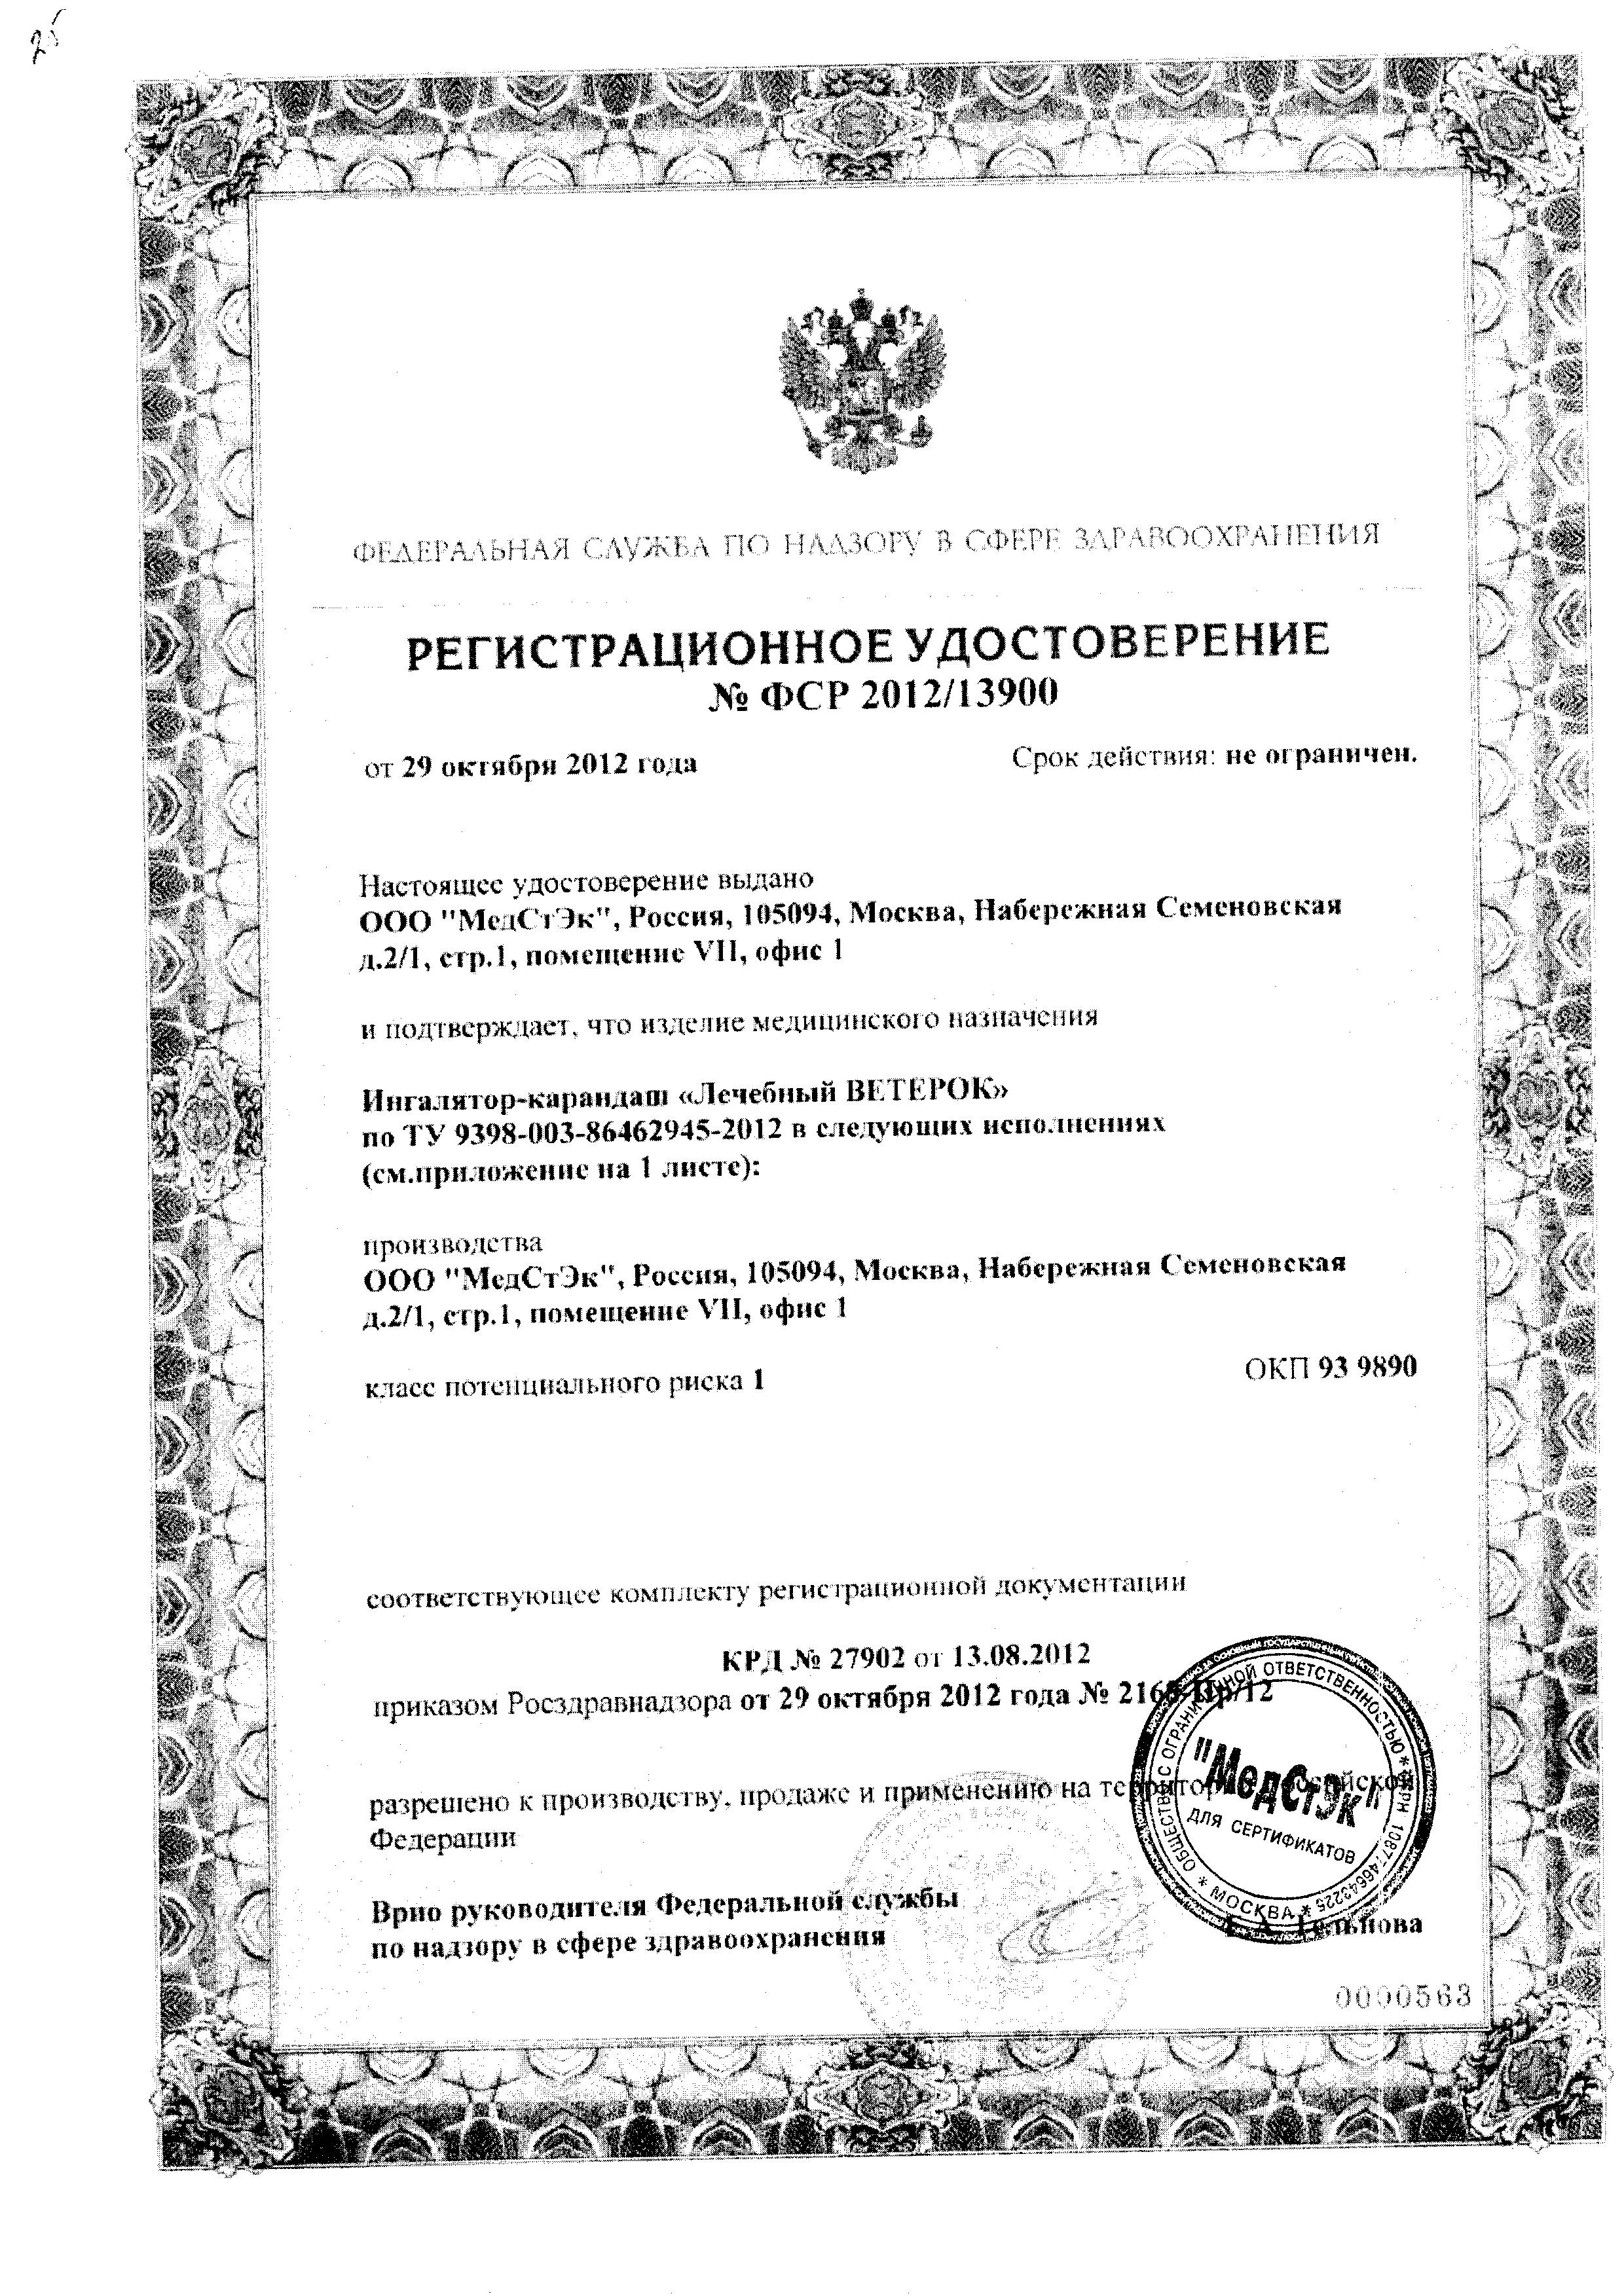 Ингалятор-карандаш Лечебный ветерок Мигренофф сертификат